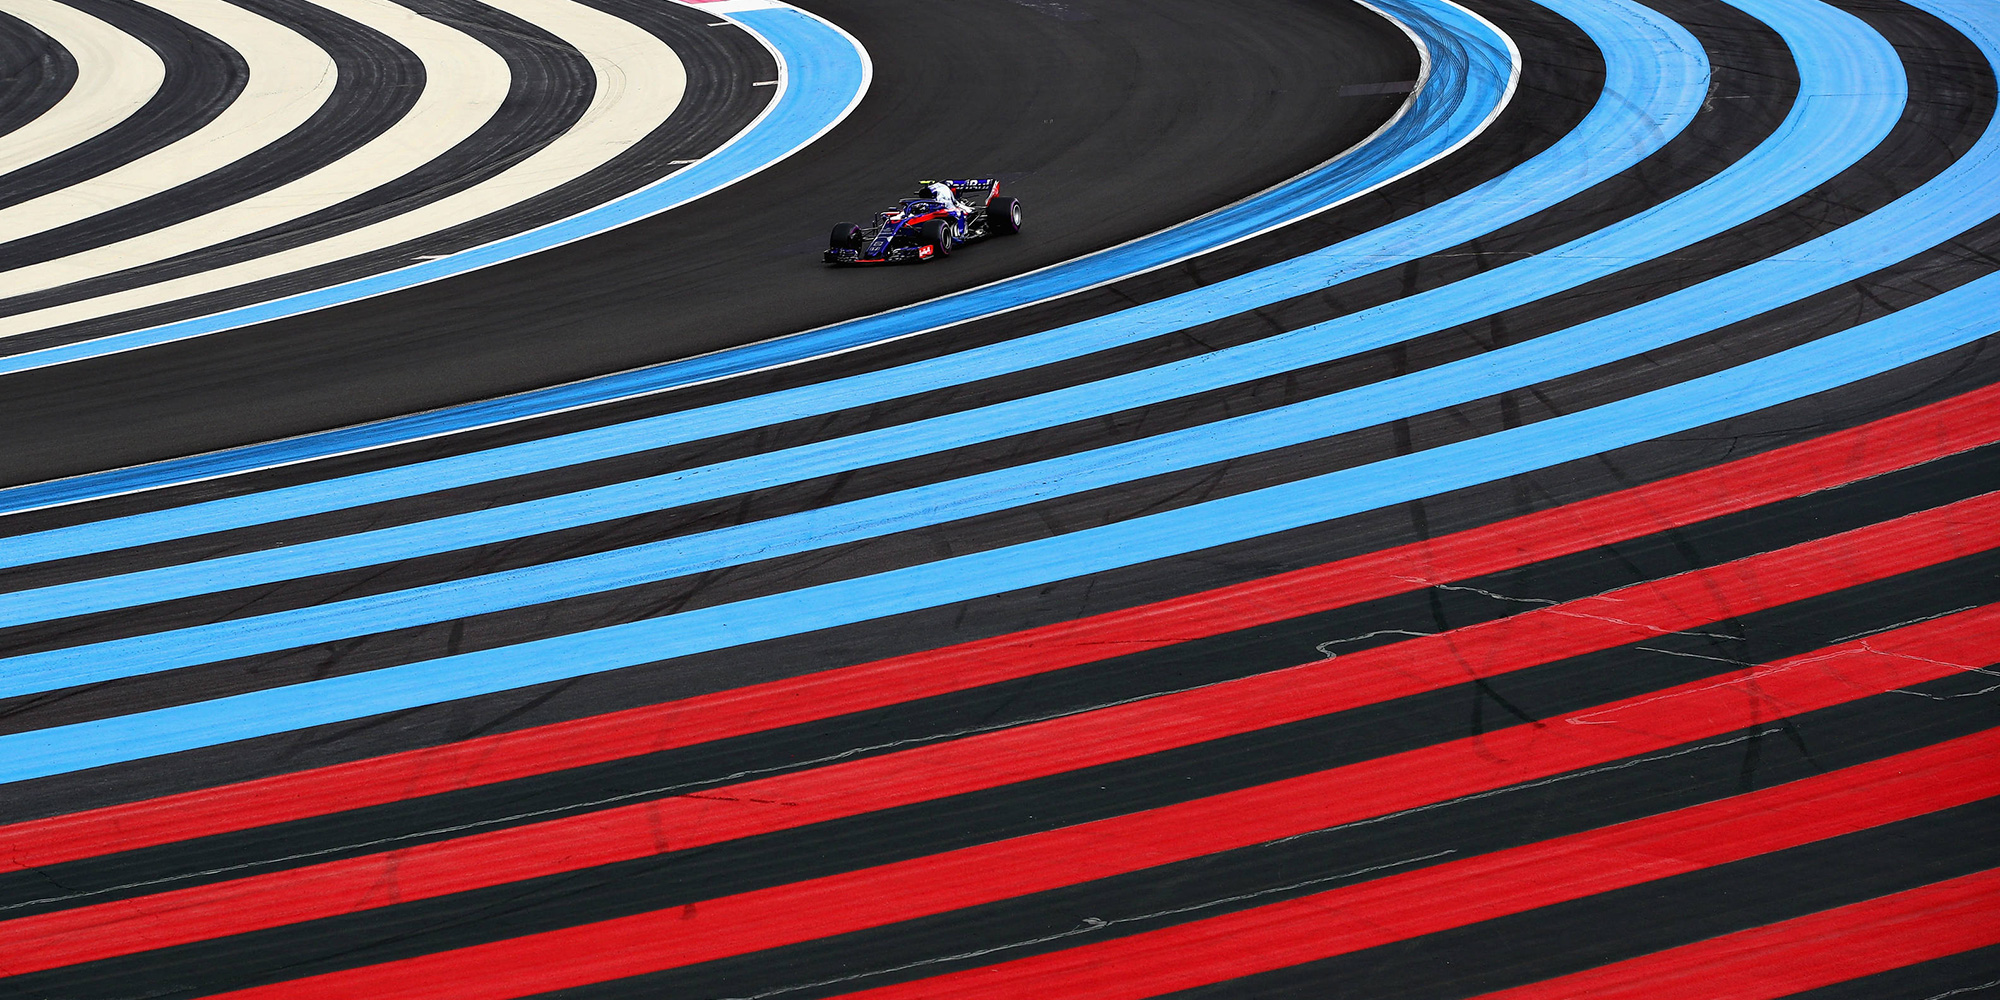 Circuit Paul Ricard >> Circuit Paul Ricard France Scuderia Toro Rosso